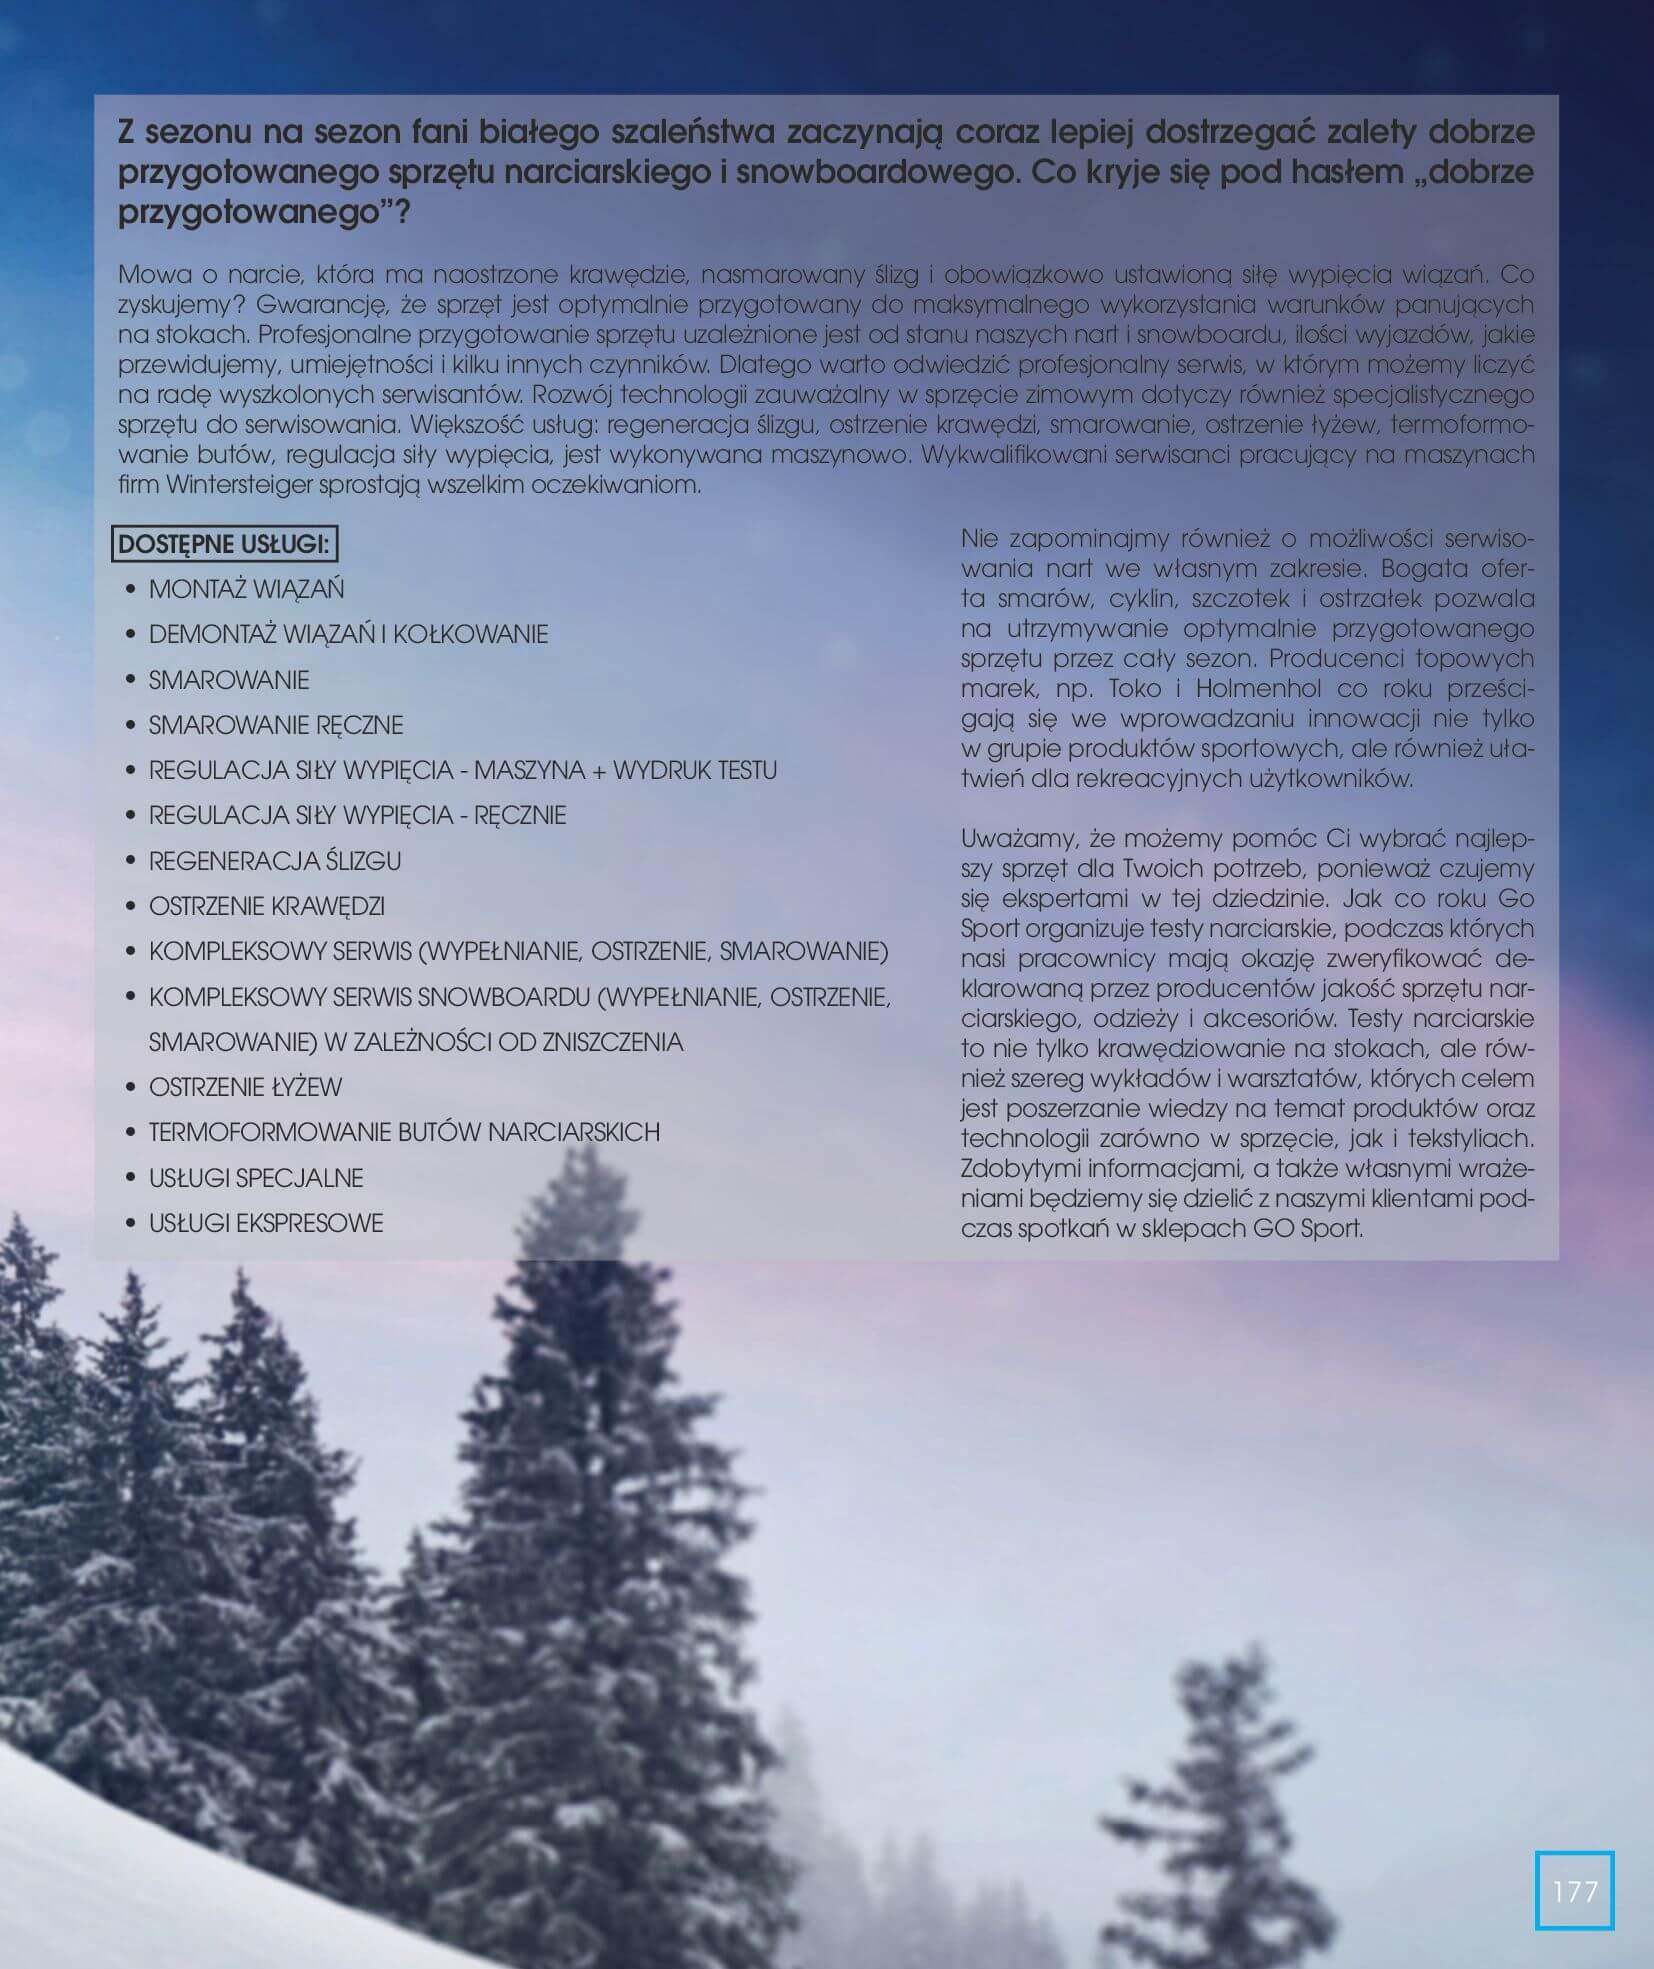 Gazetka Go Sport - Katalog Zima 2017/2018-12.11.2017-28.02.2018-page-177